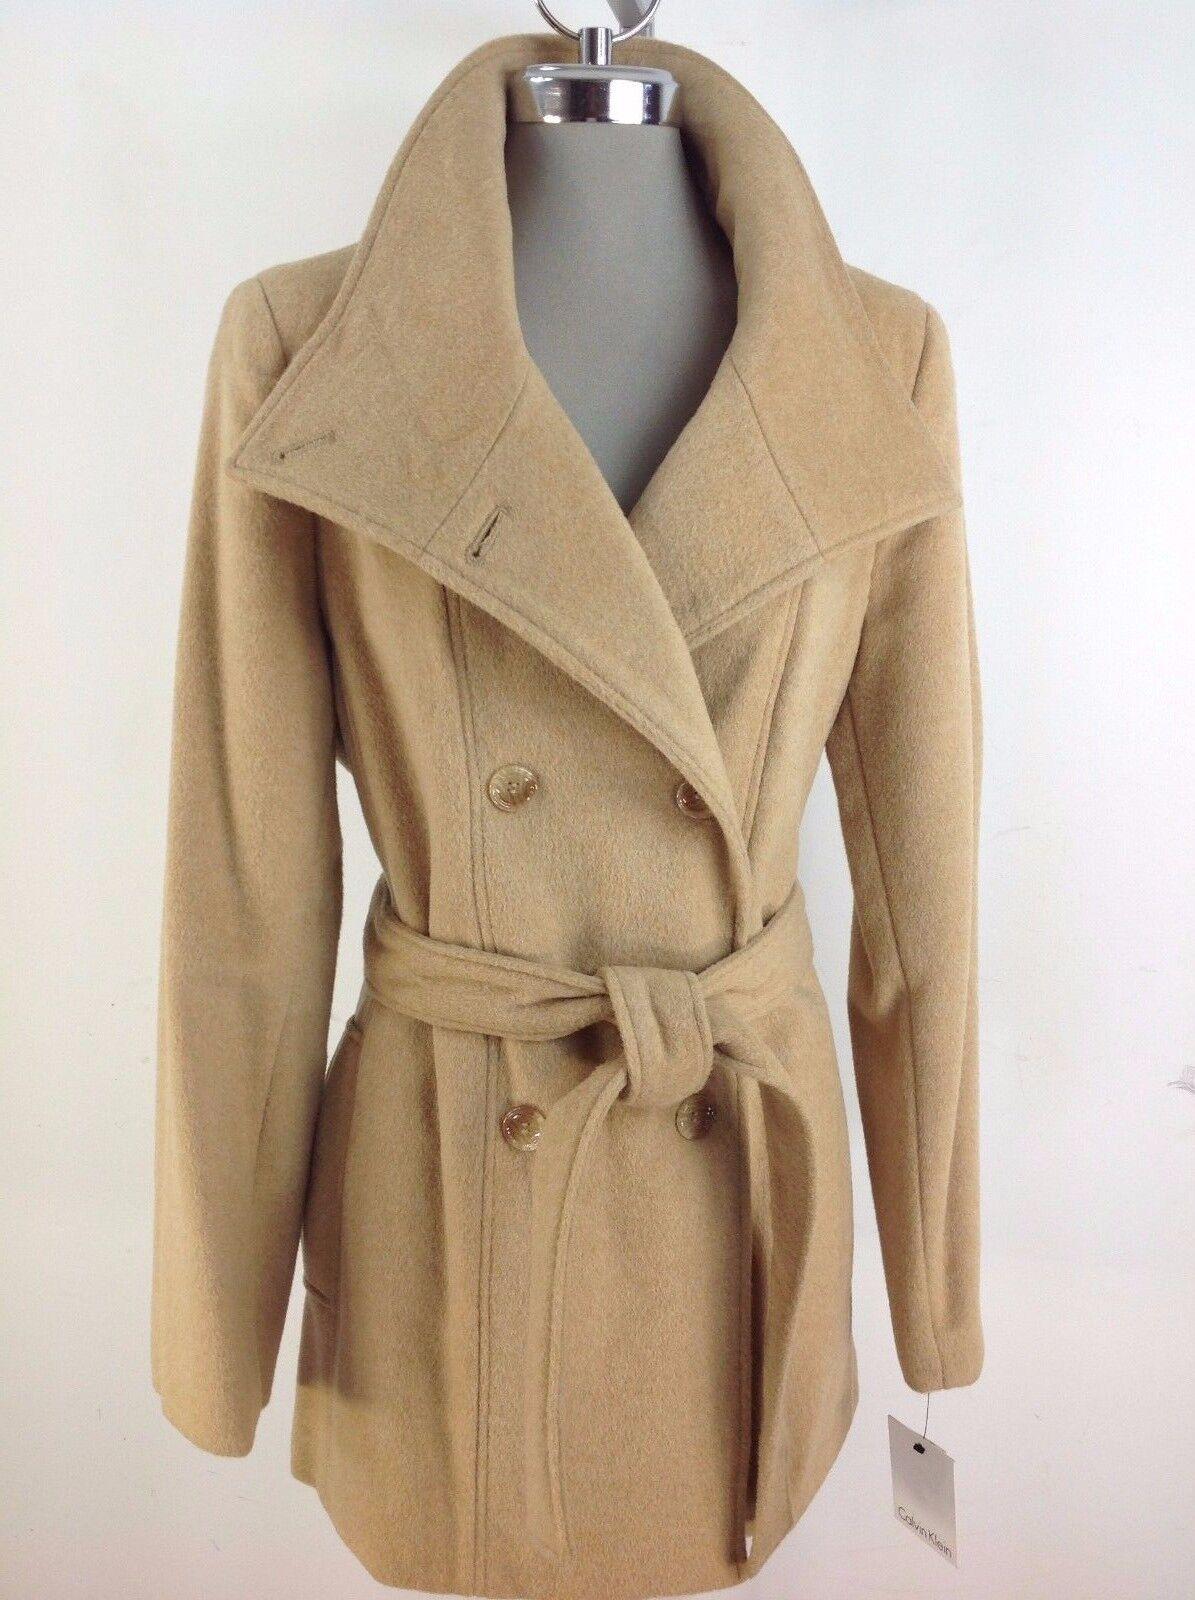 Calvin Klein S Women's Camel Wool Blend Belted Peacoat Size 8 14 ...